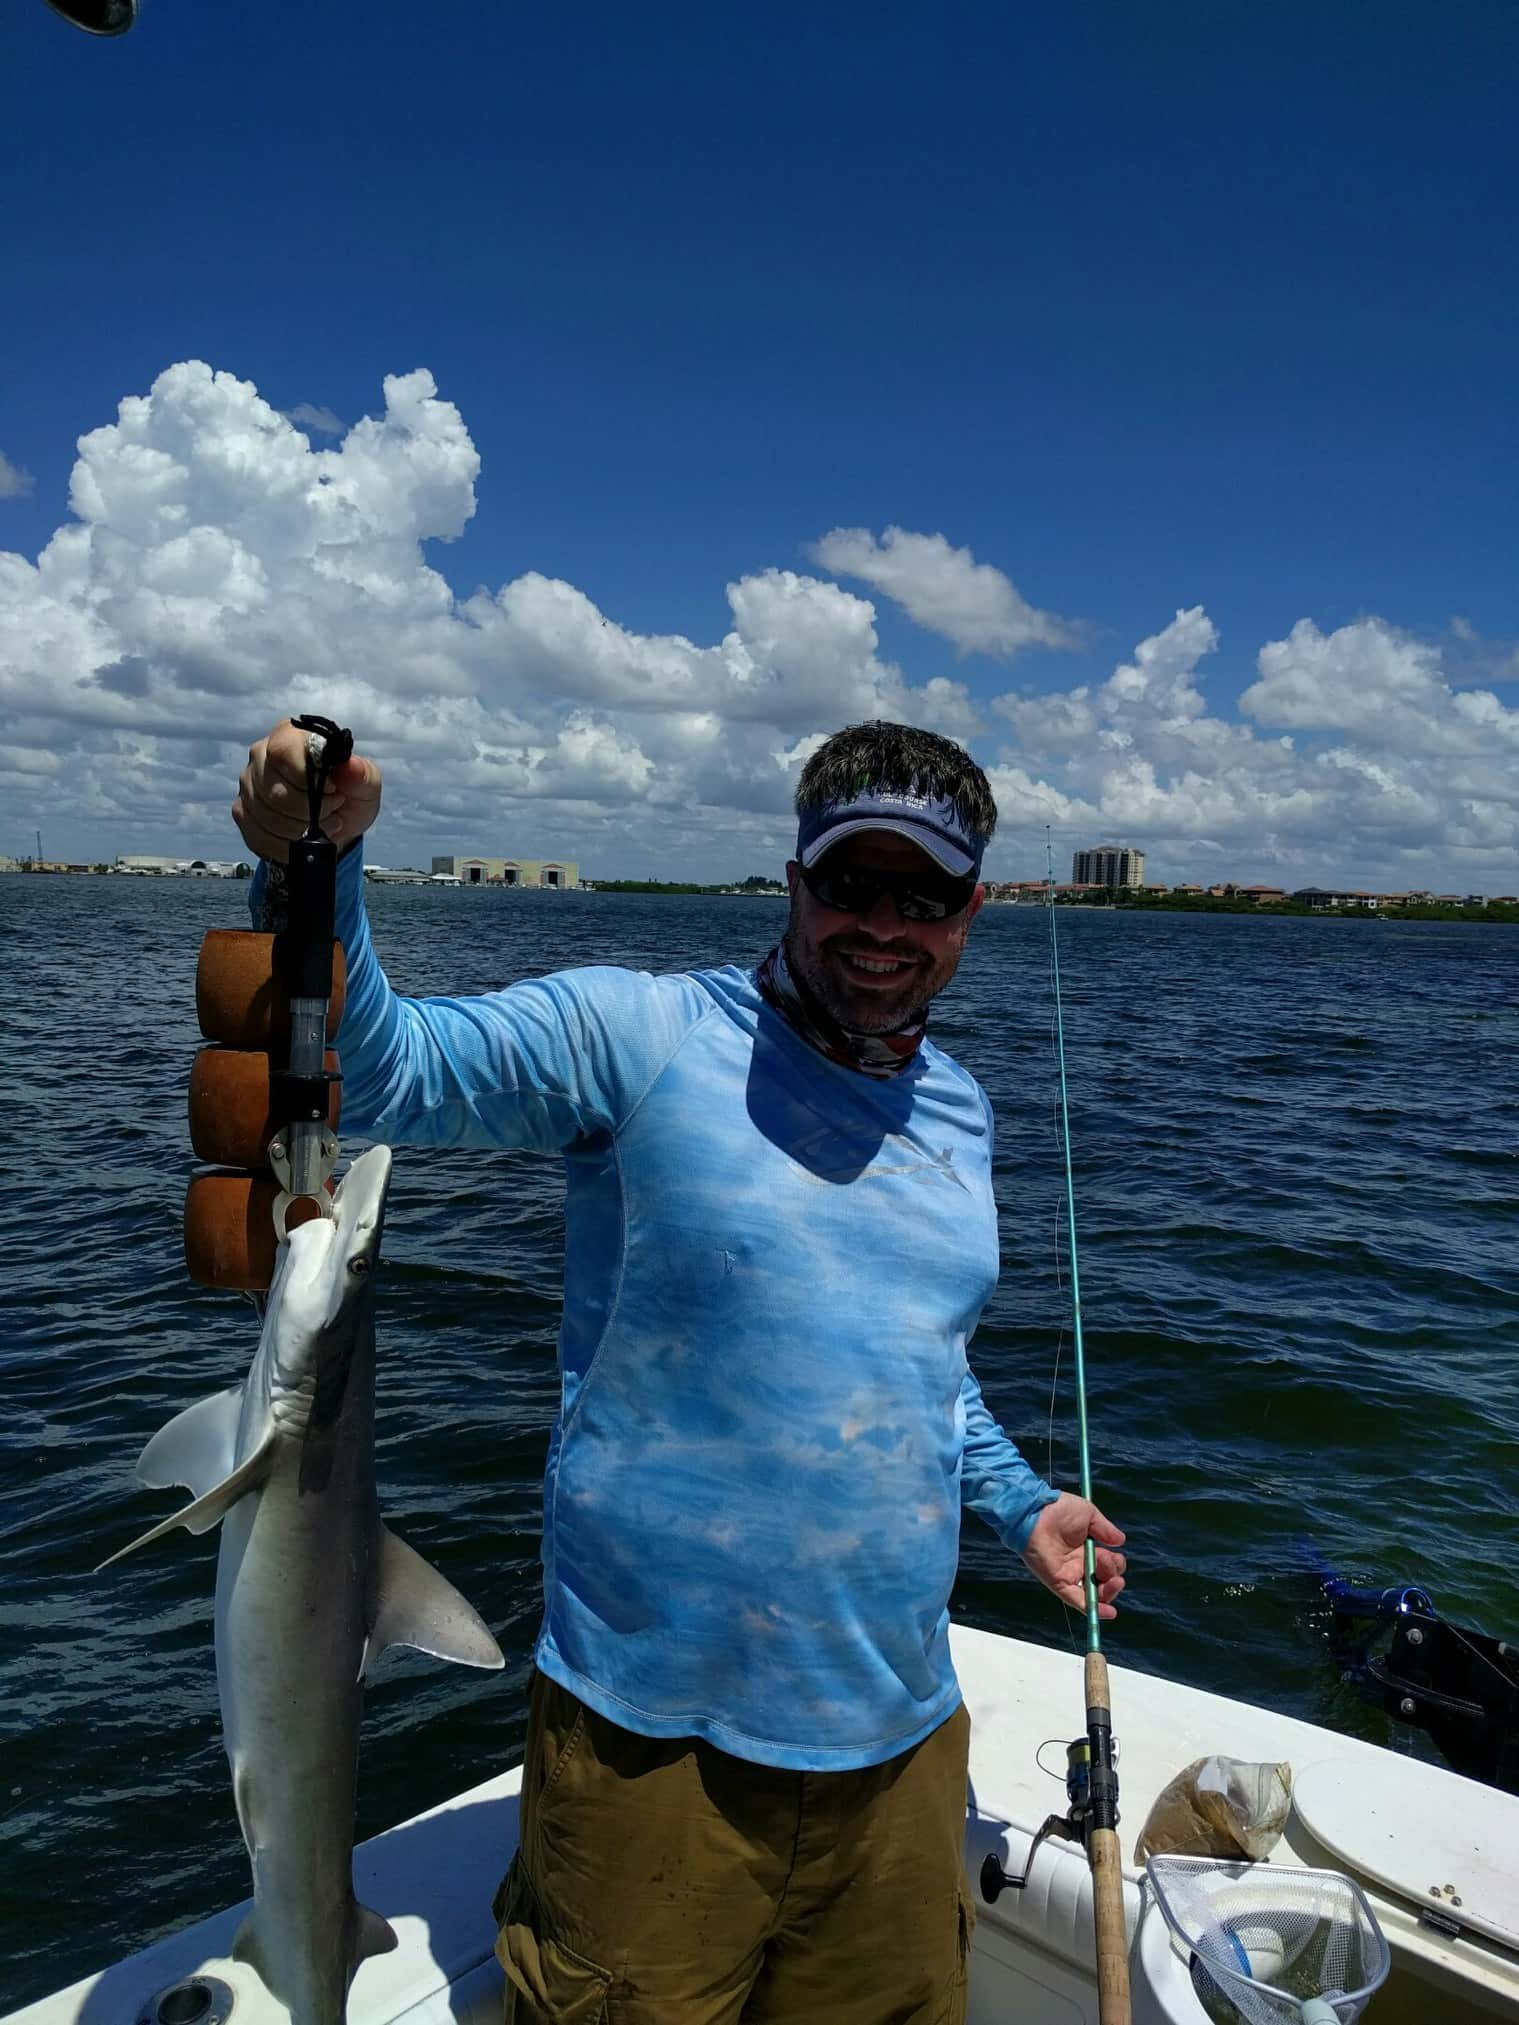 Tampa bay florida fishing charters 813 758 3406 for Charter fishing tampa